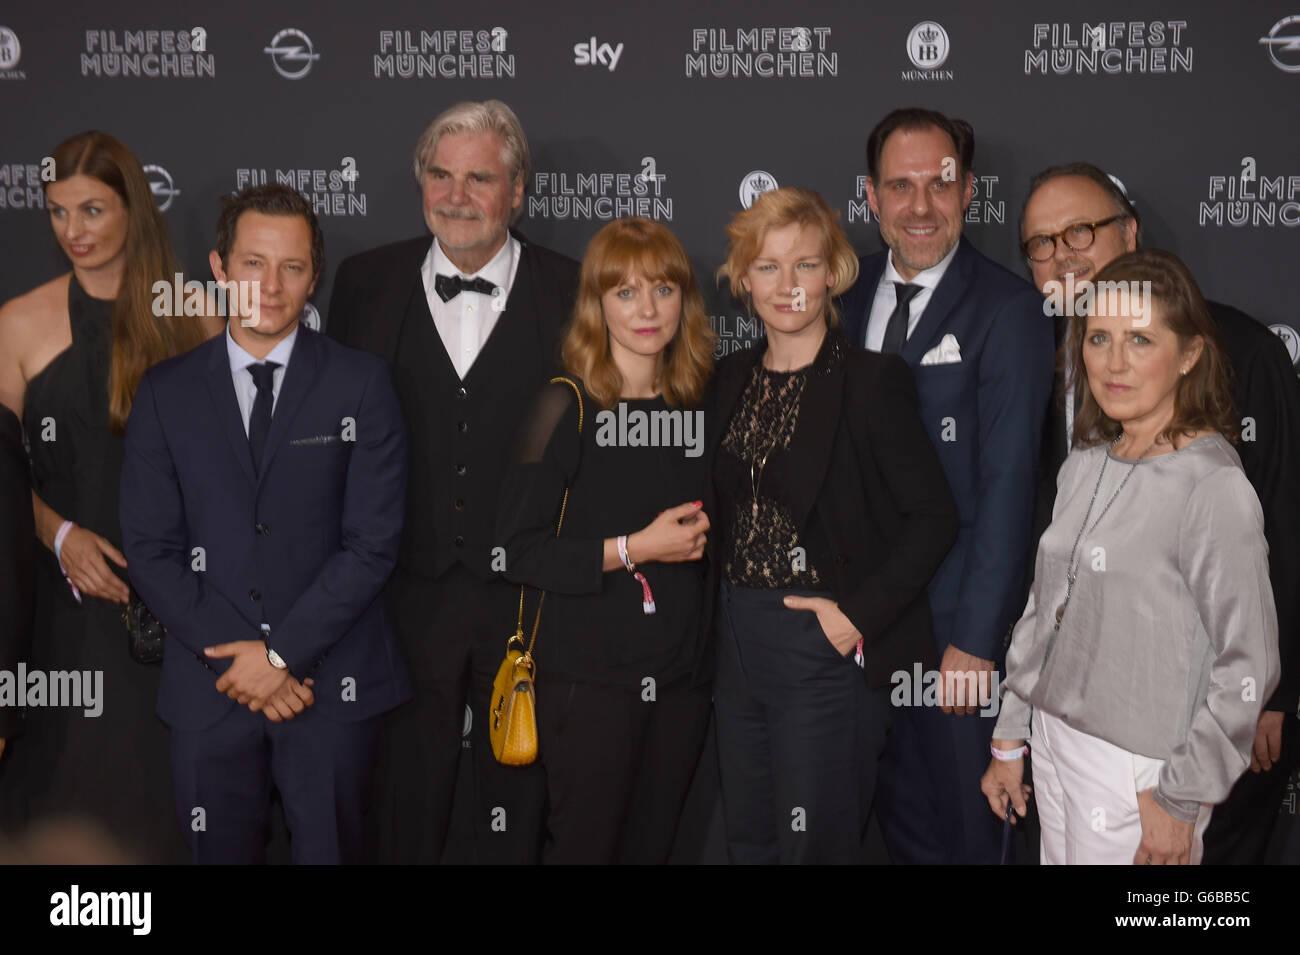 Munich, Germany. 23rd June, 2016. Actor Peter Simonischek (3-L), director Maren Ade (4-L), actress Sandra Huller Stock Photo